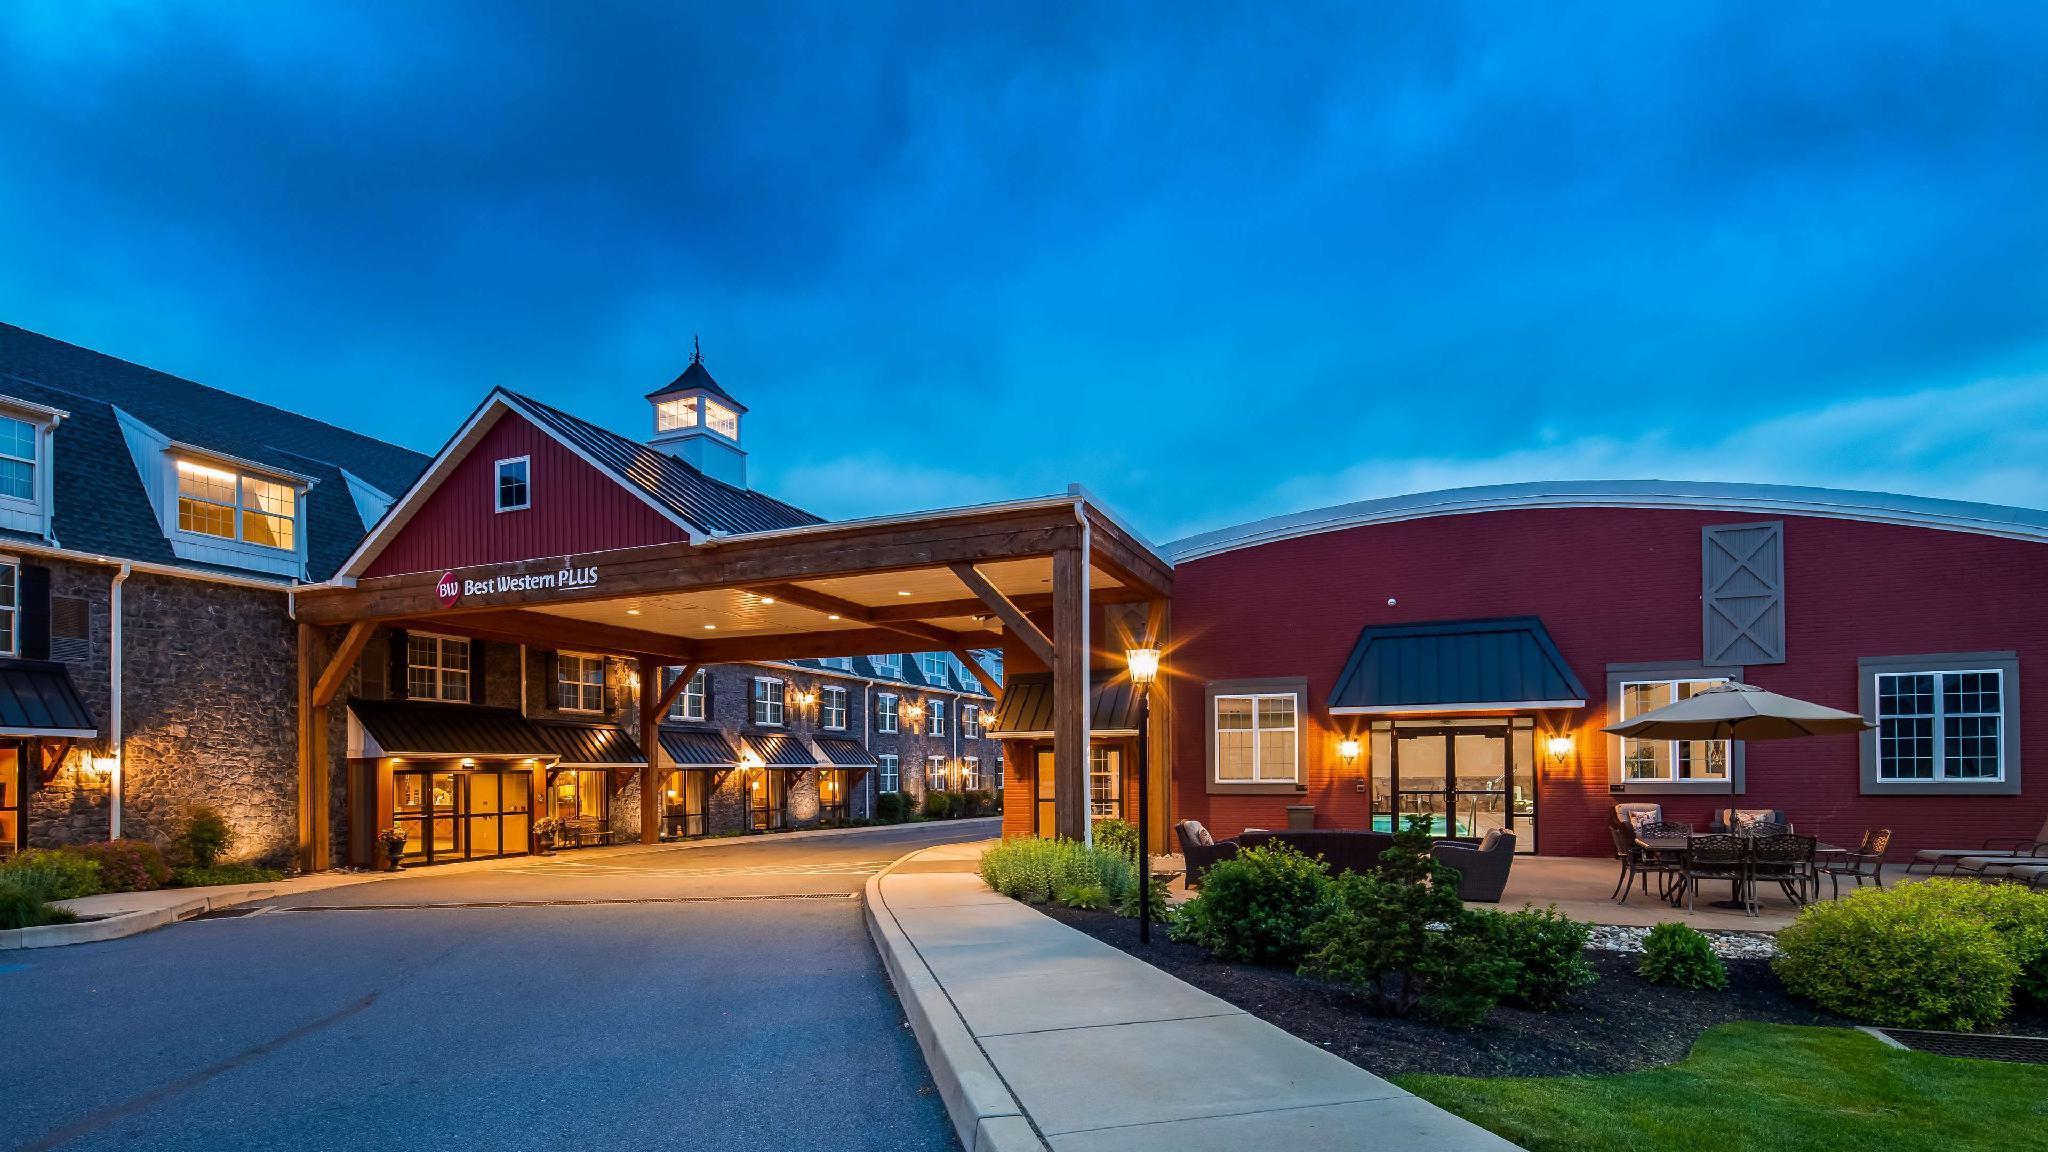 Best Western Plus Intercourse Village Inn And Suites